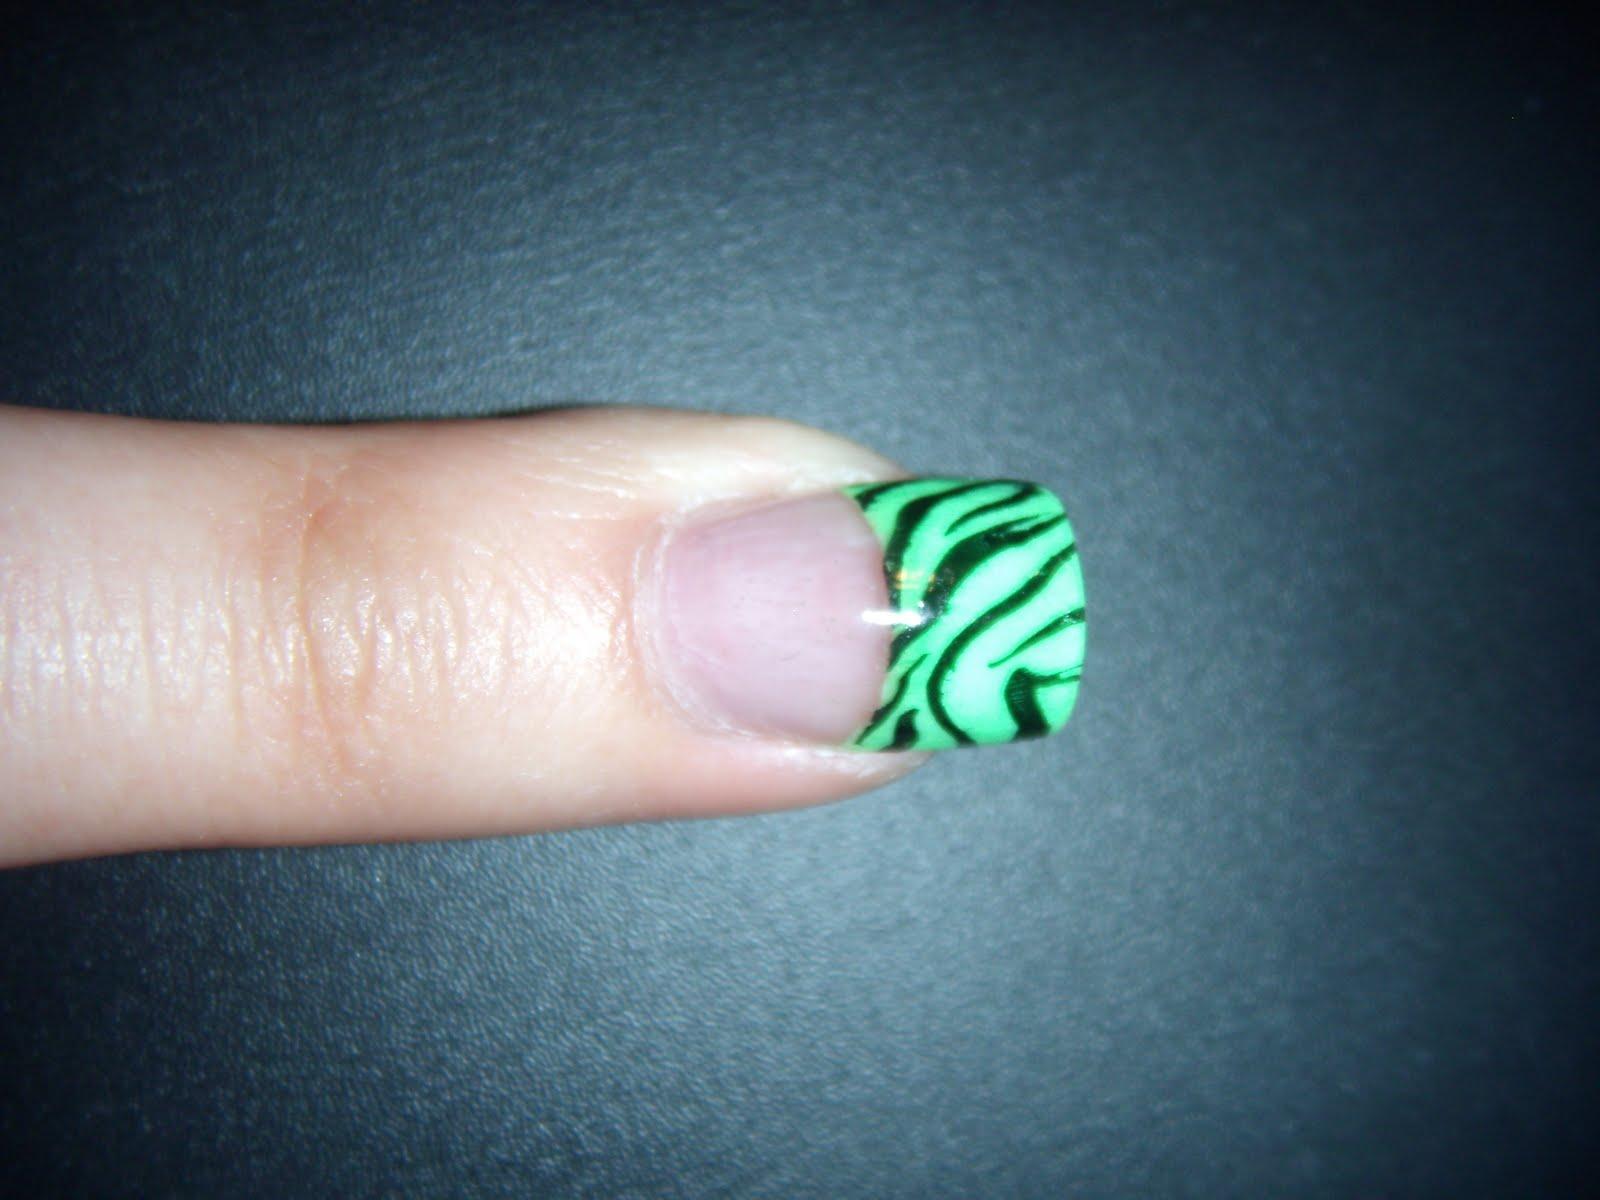 Acrylic Nail Designs - Buzzle Web Portal: Intelligent Life on the Web